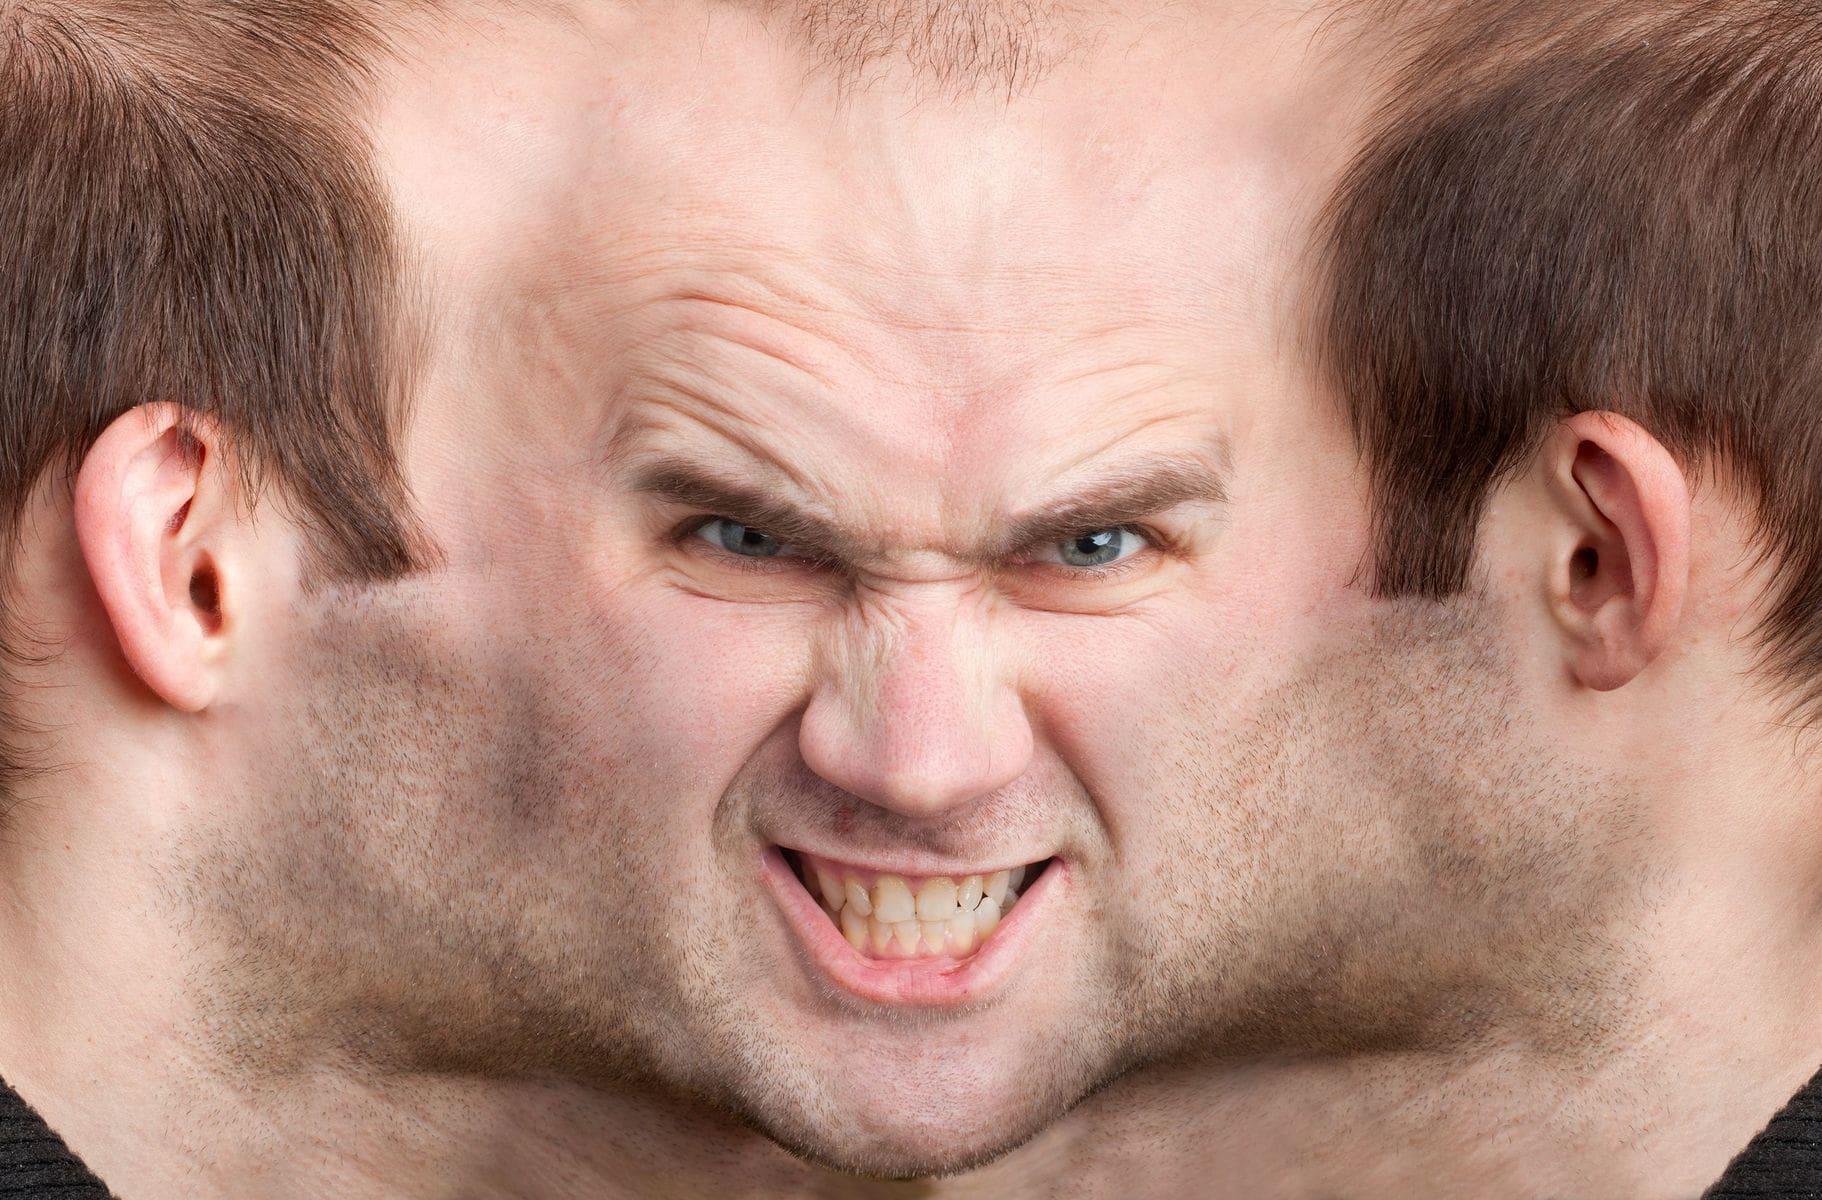 Man suffering with schizophrenia